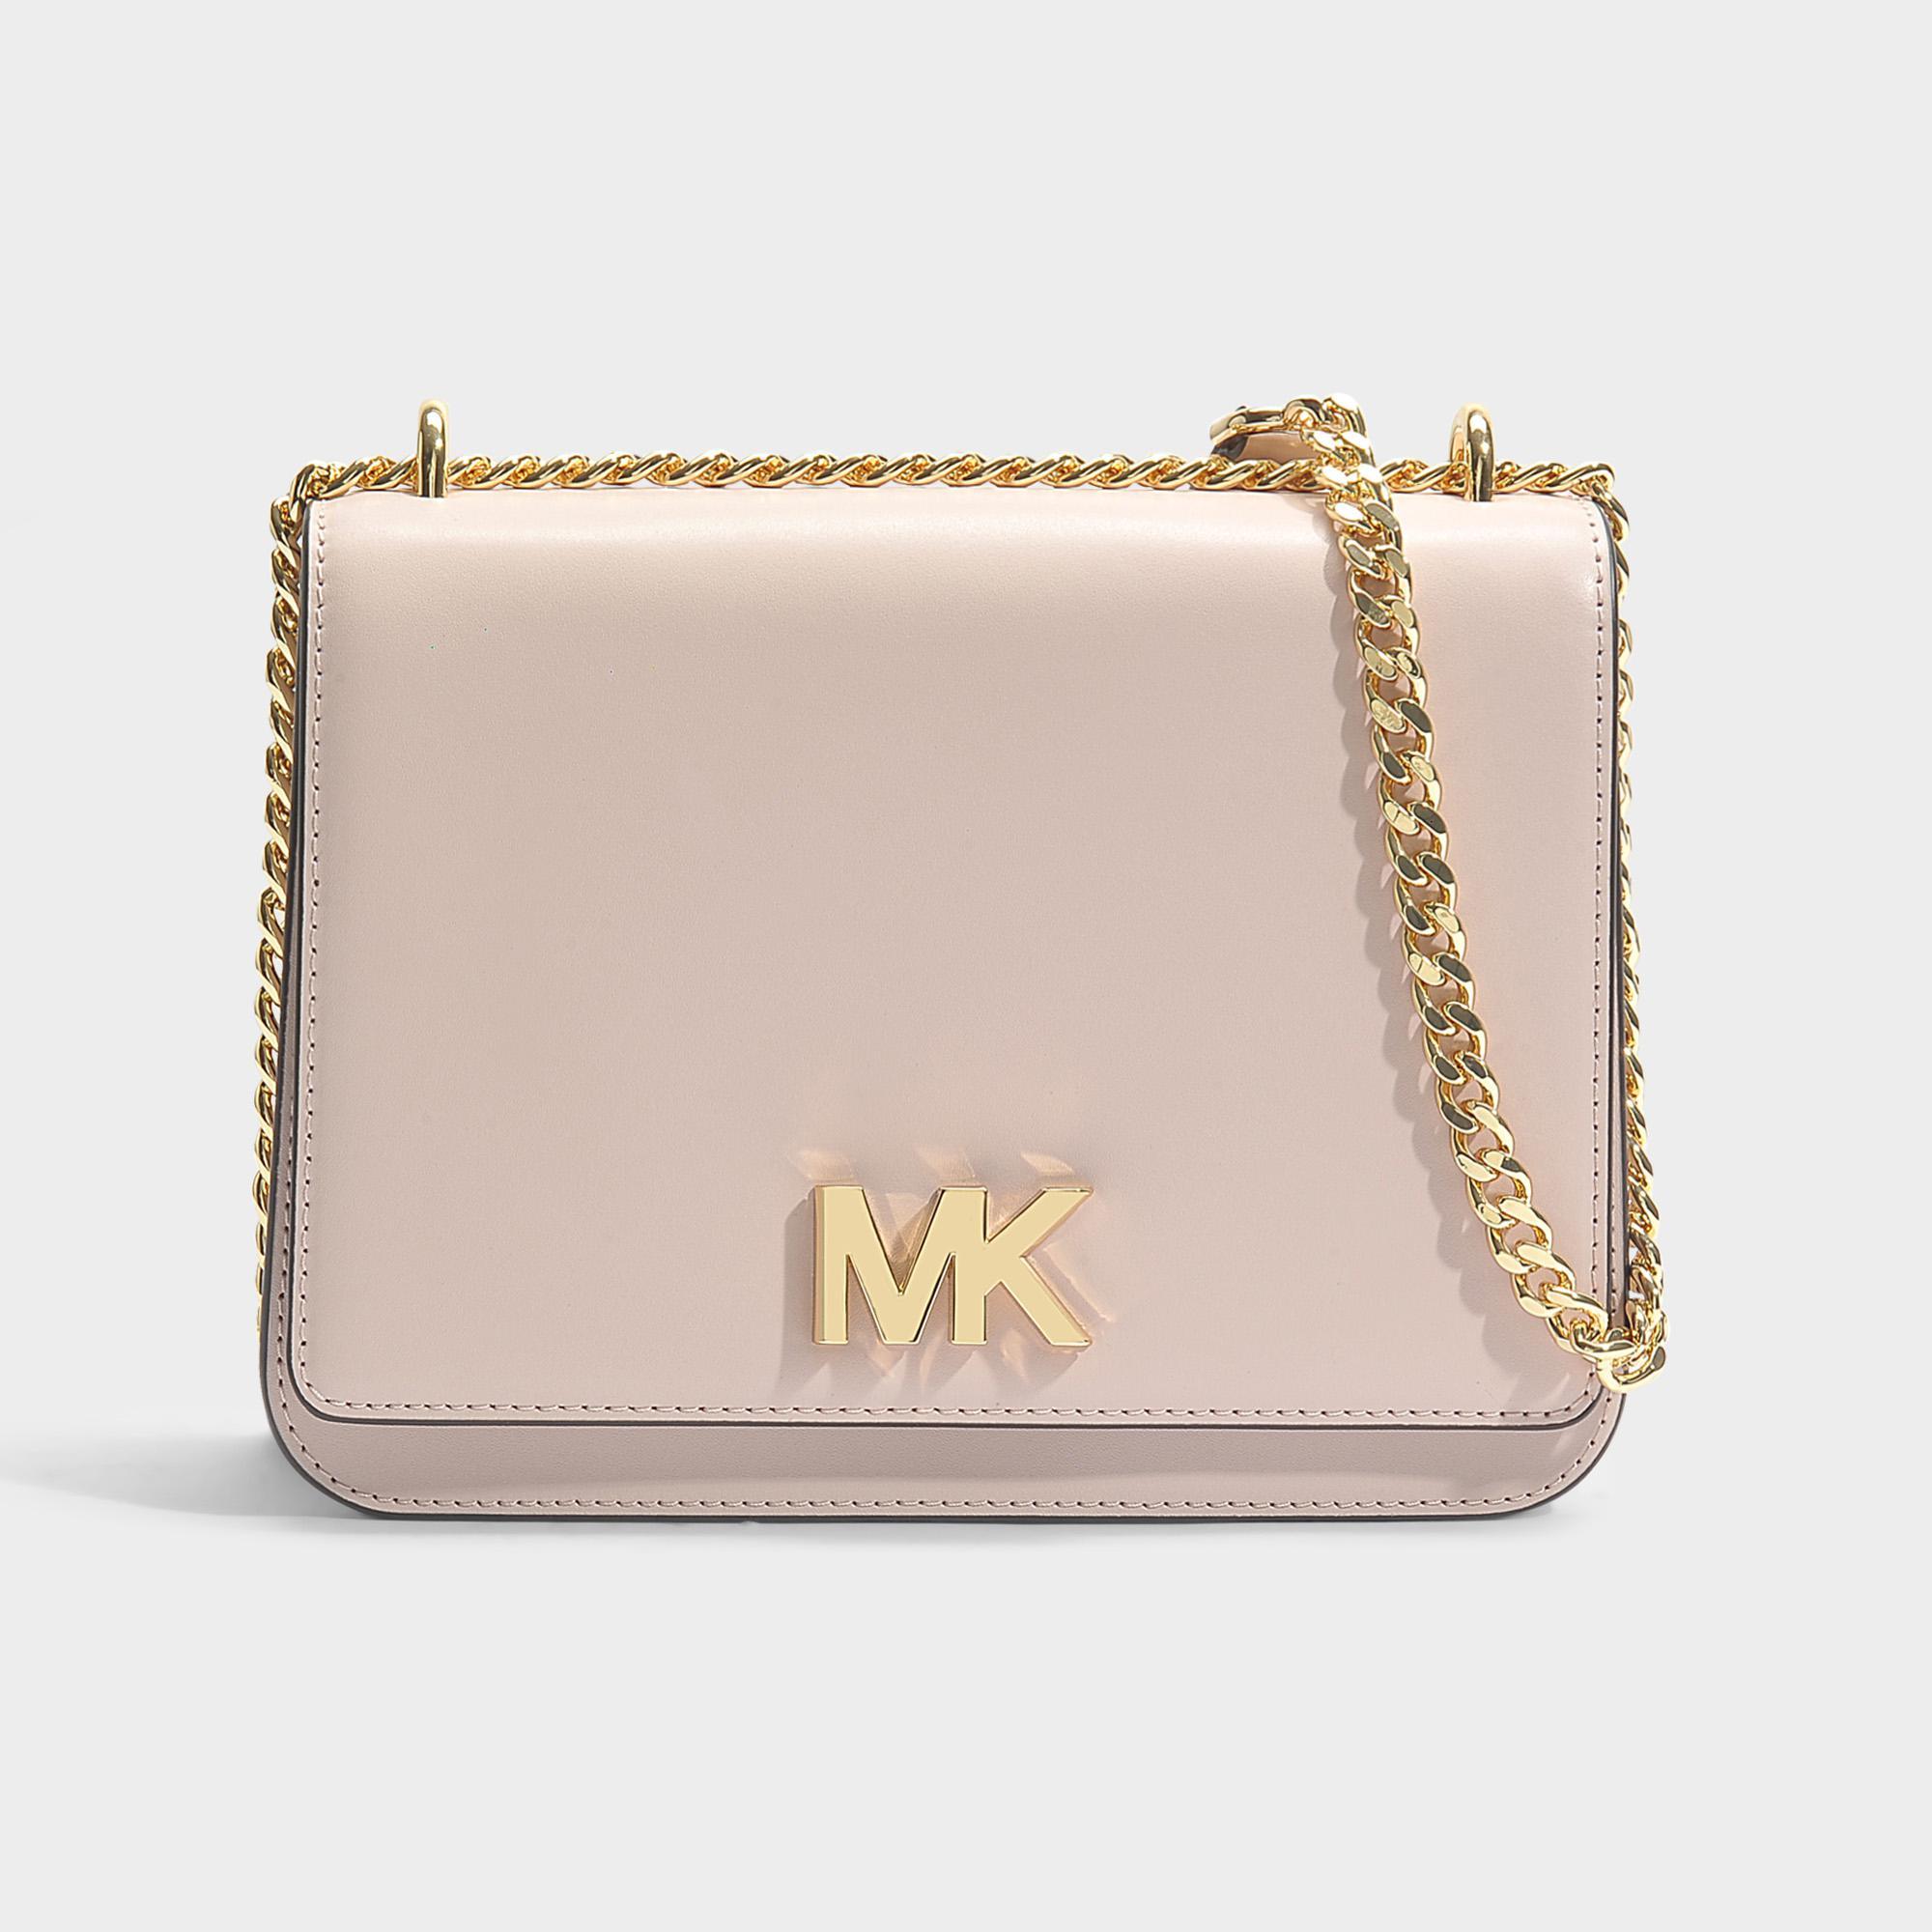 d9caee2c170c Lyst - MICHAEL Michael Kors Mott Large Chain Shoulder Bag In Soft ...